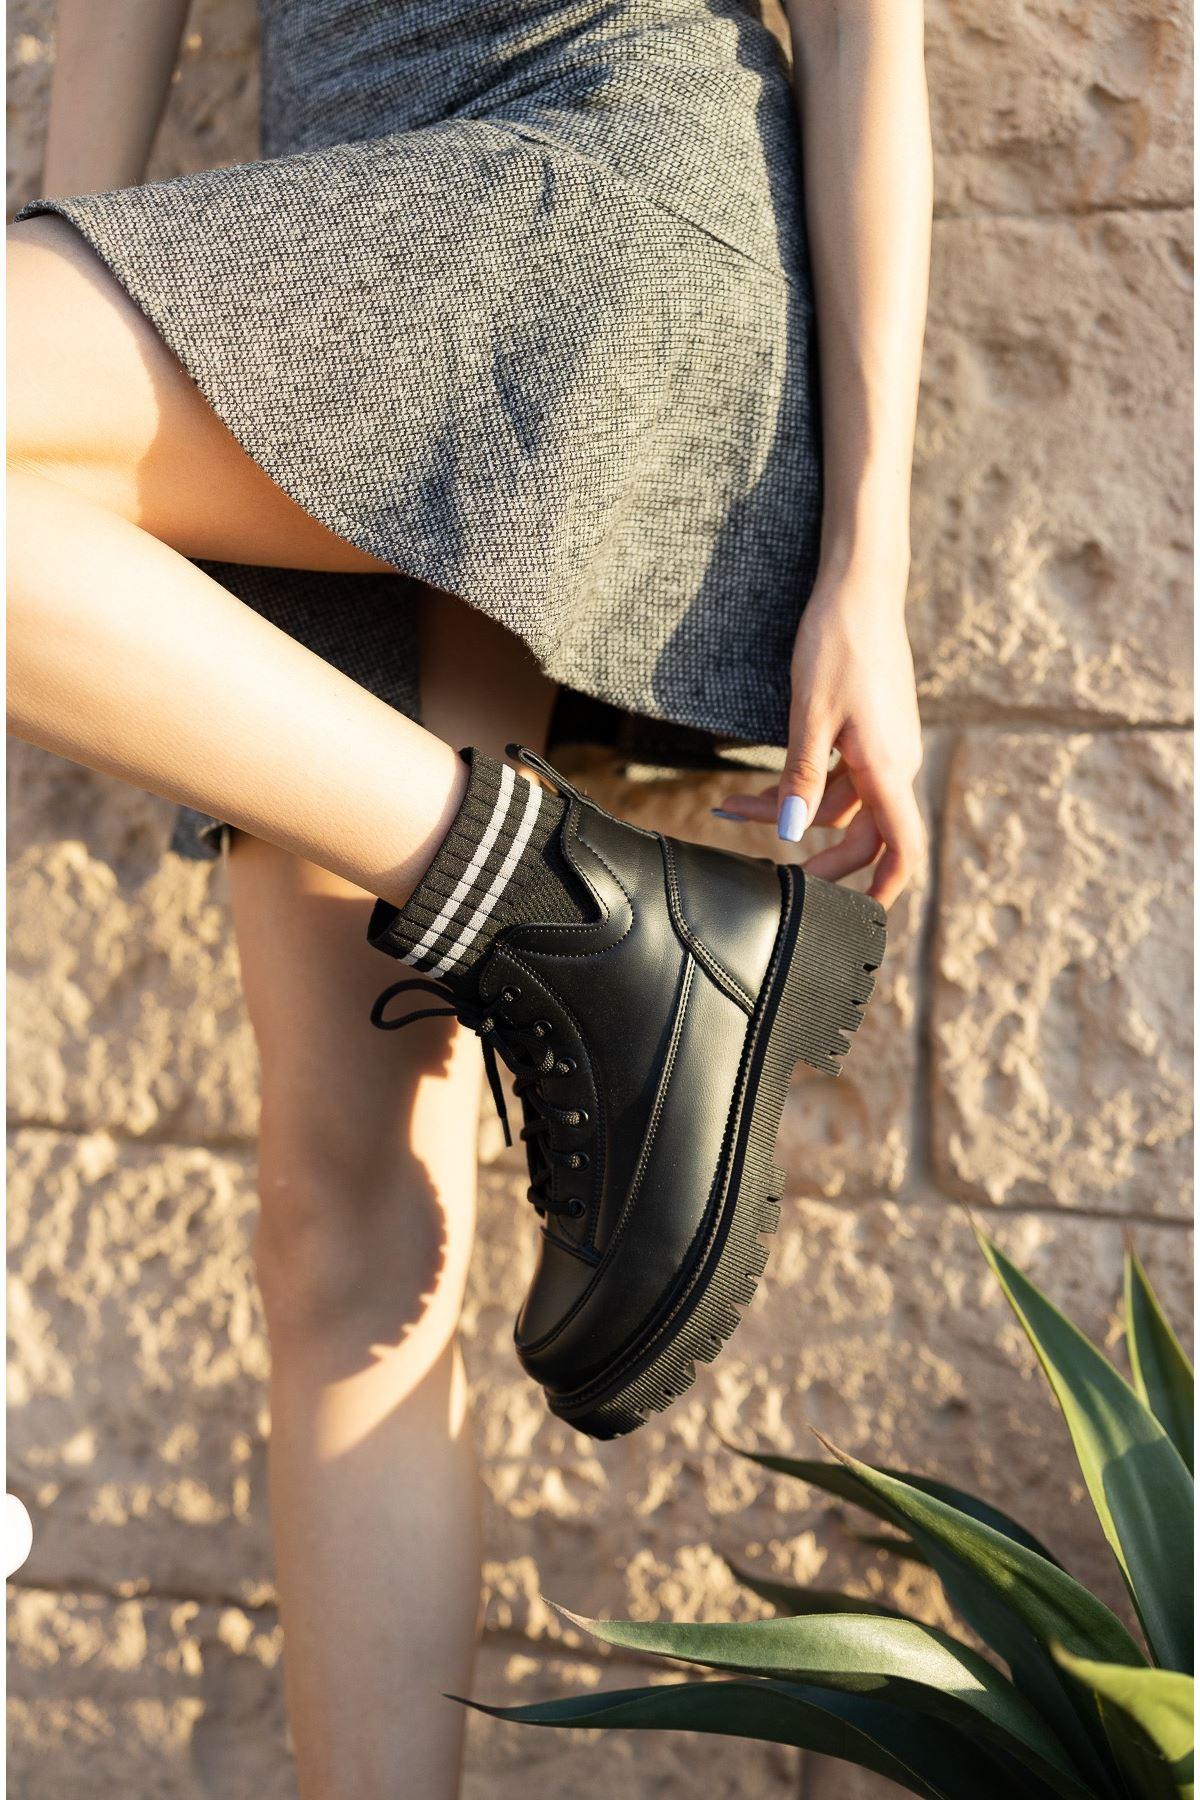 Kadın Tiger Triko Detay Kısa Topuklu Siyah Mat Deri Postal Bot